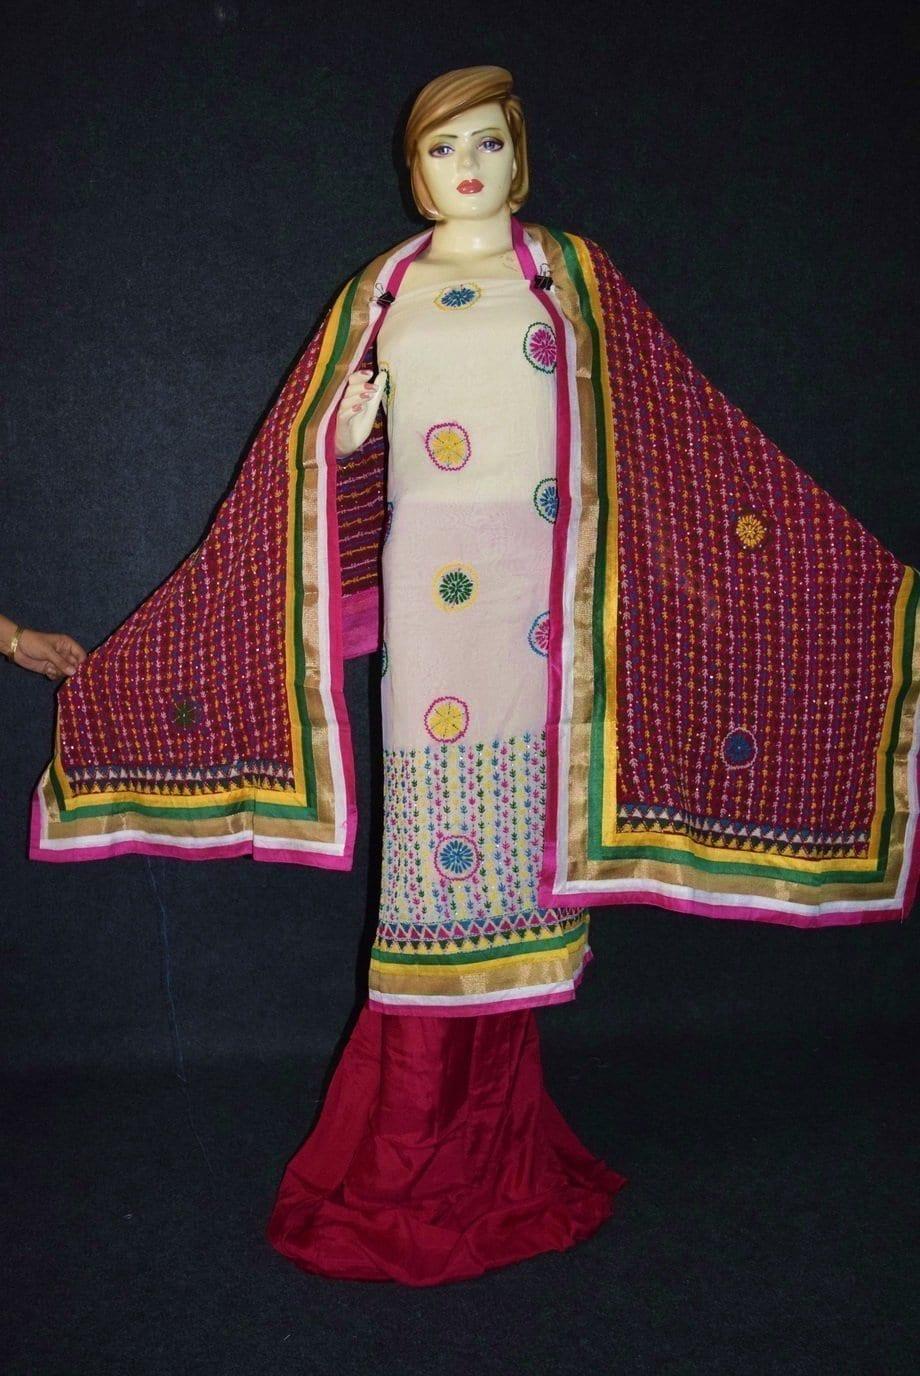 Party Wear Georgette hand Embroidered Salwar kameez stole suit set F0657 3